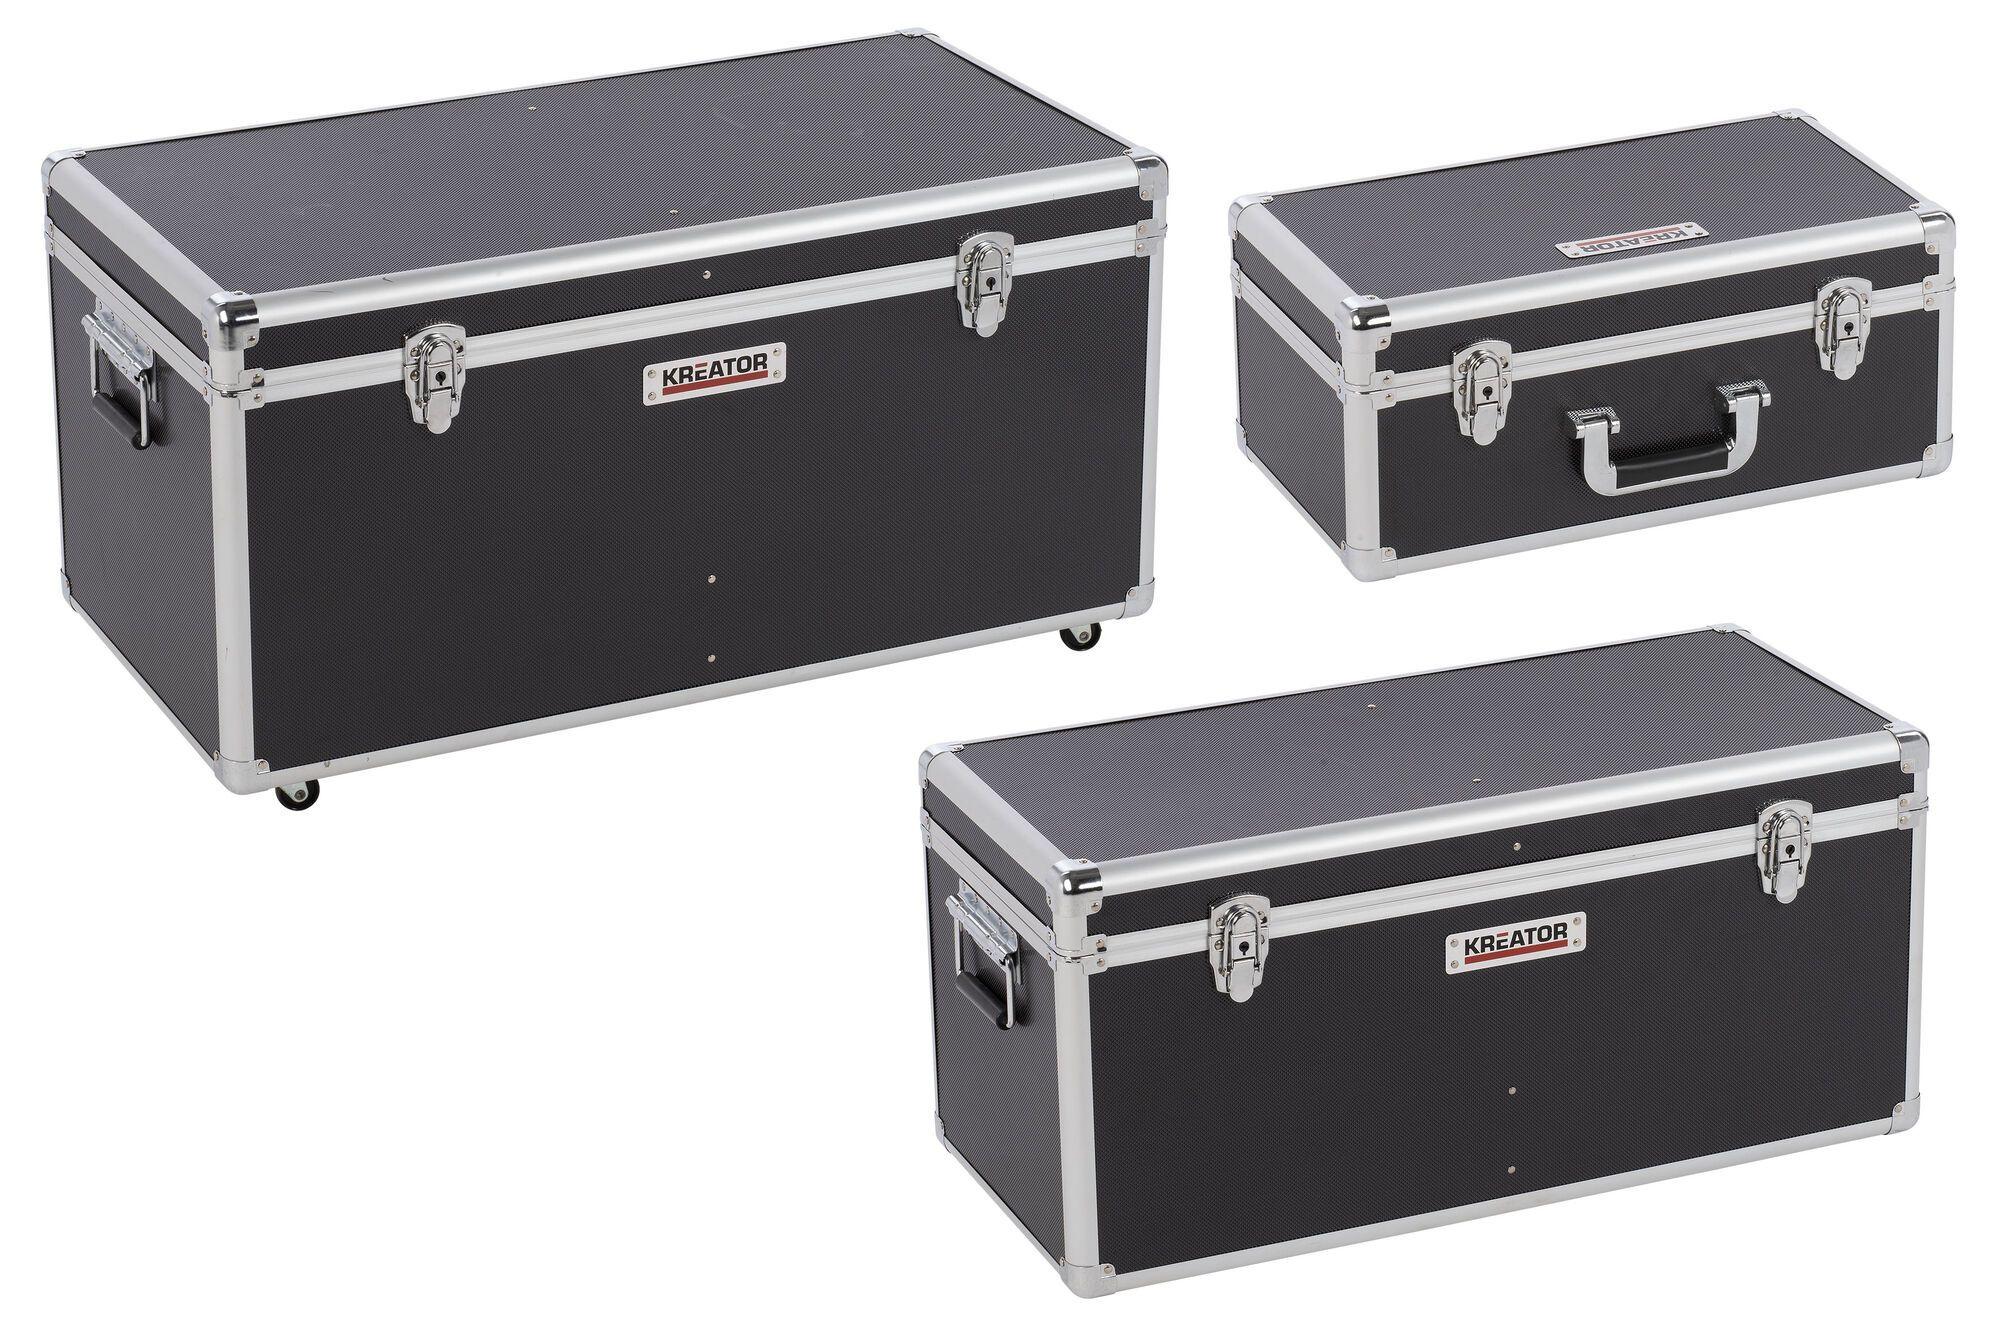 Kreator KRT640501B Aluminium opbergkoffers | Set zwarte koffers | 3 in 1